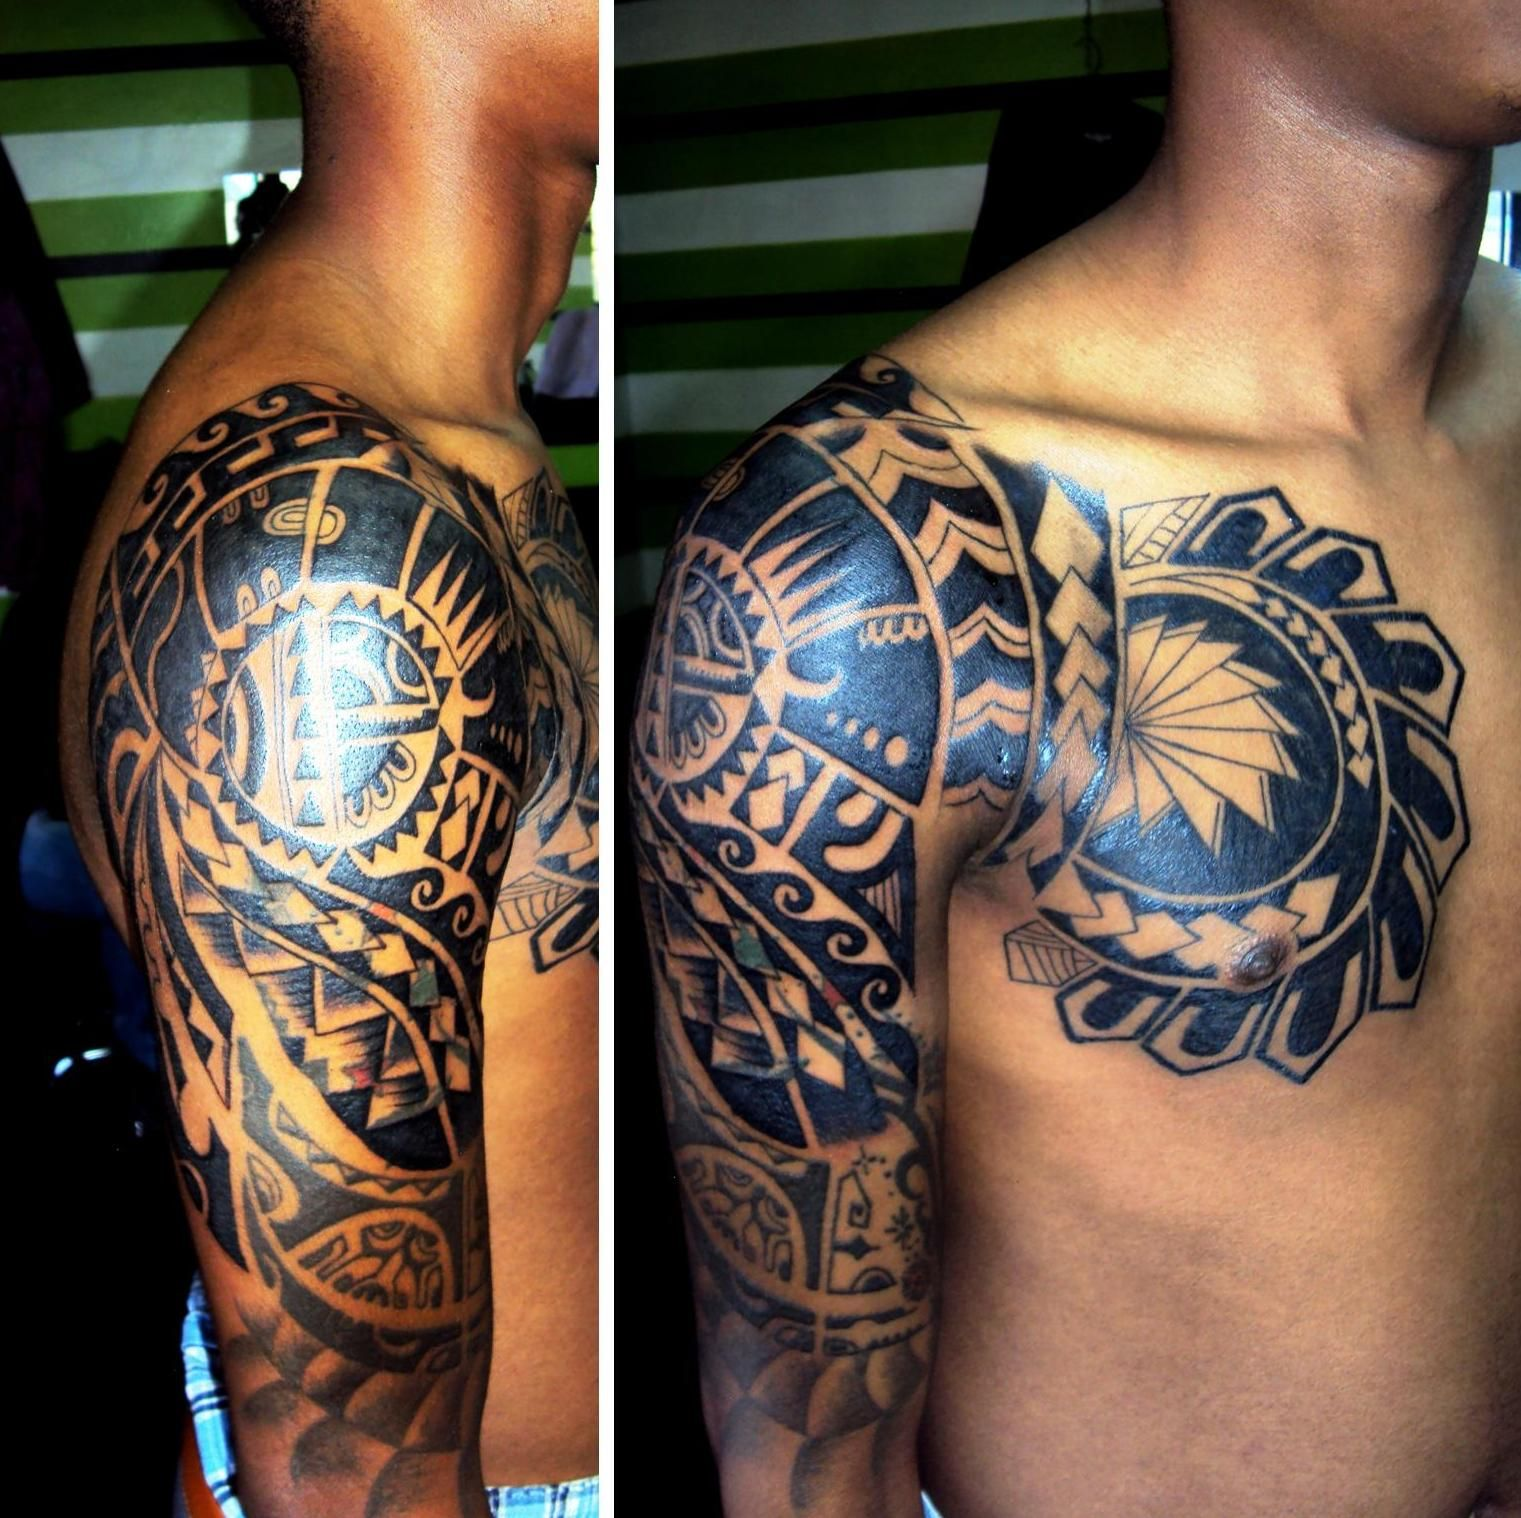 Maori Chest And Half A Sleeve Tribal Tattoo Tribal Tattoos Tattoos Tribal Tattoo Pictures